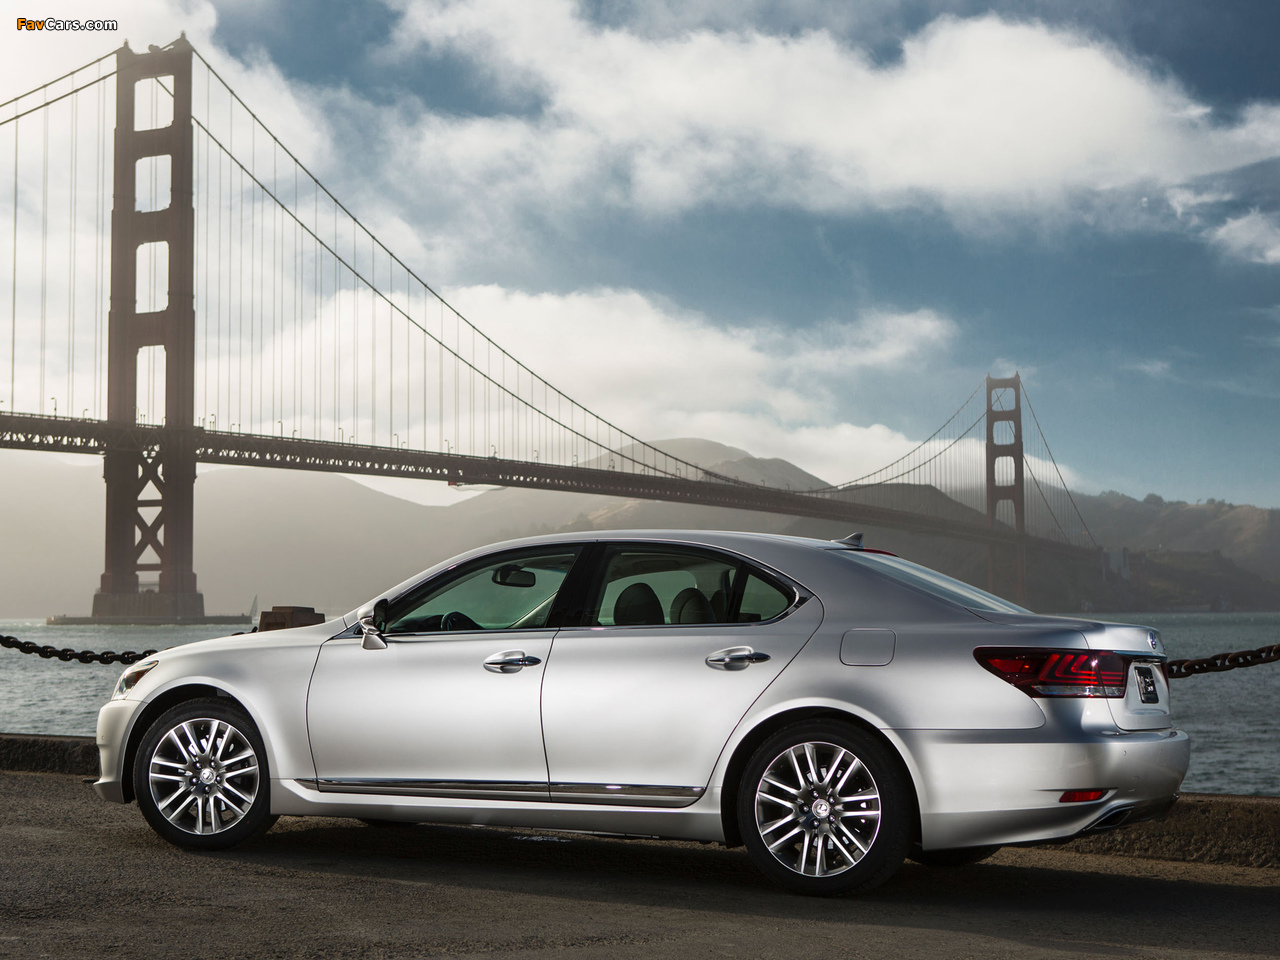 Lexus LS 460 2012 images (1280 x 960)